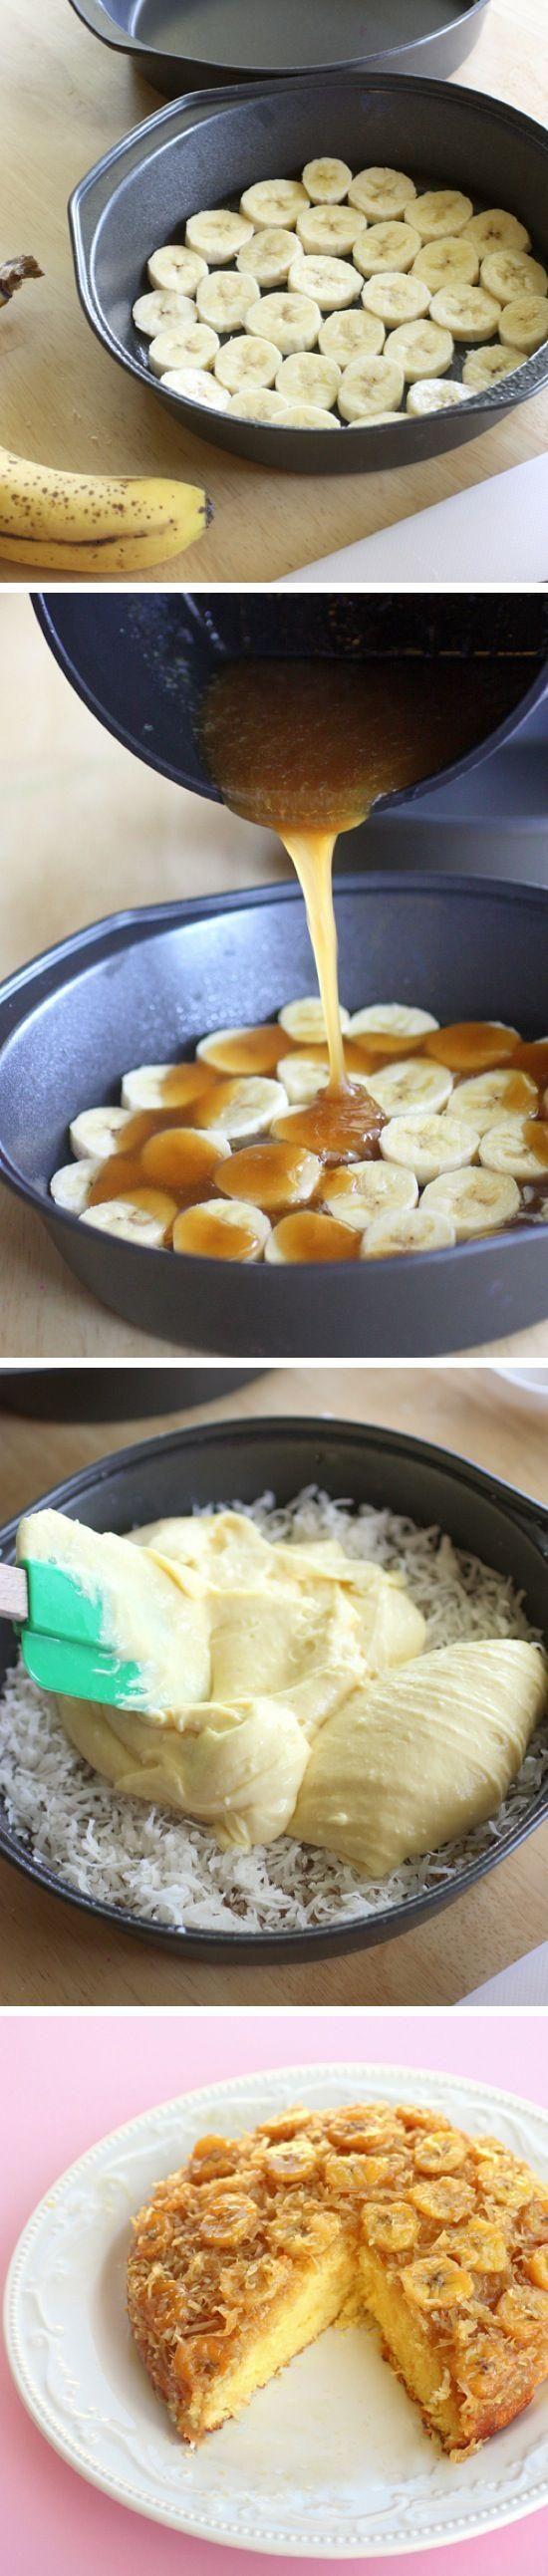 Banana Coconut Upside Down Cake - Joybx | food glorious food | Pinter ...